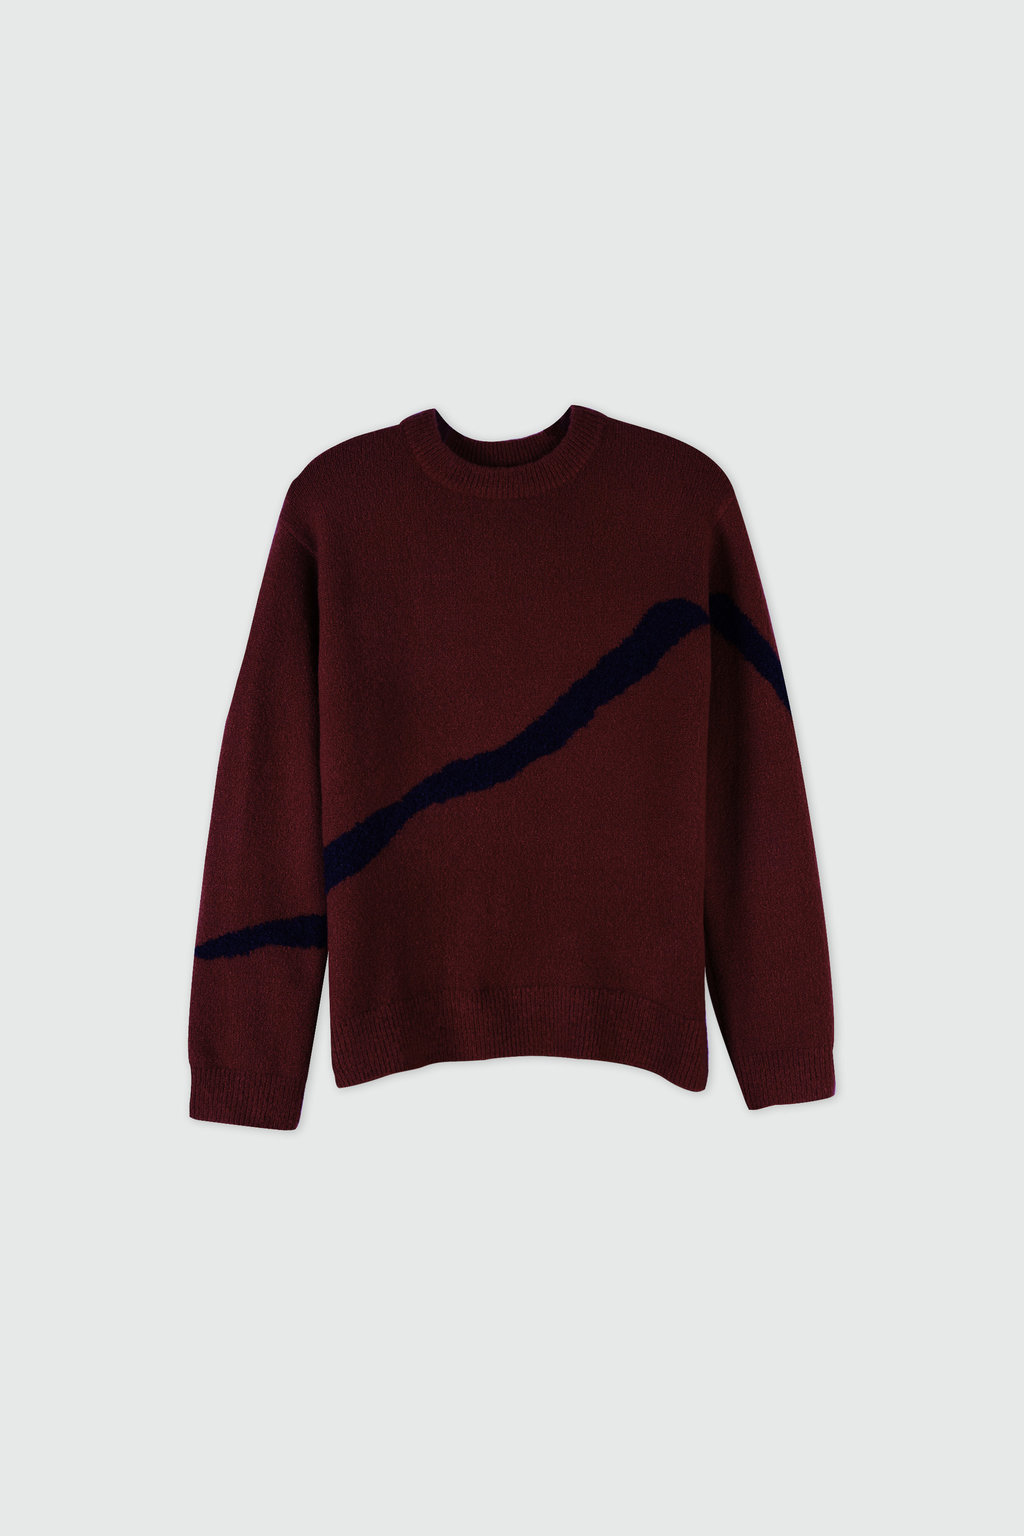 Sweater 2710 Wine 12